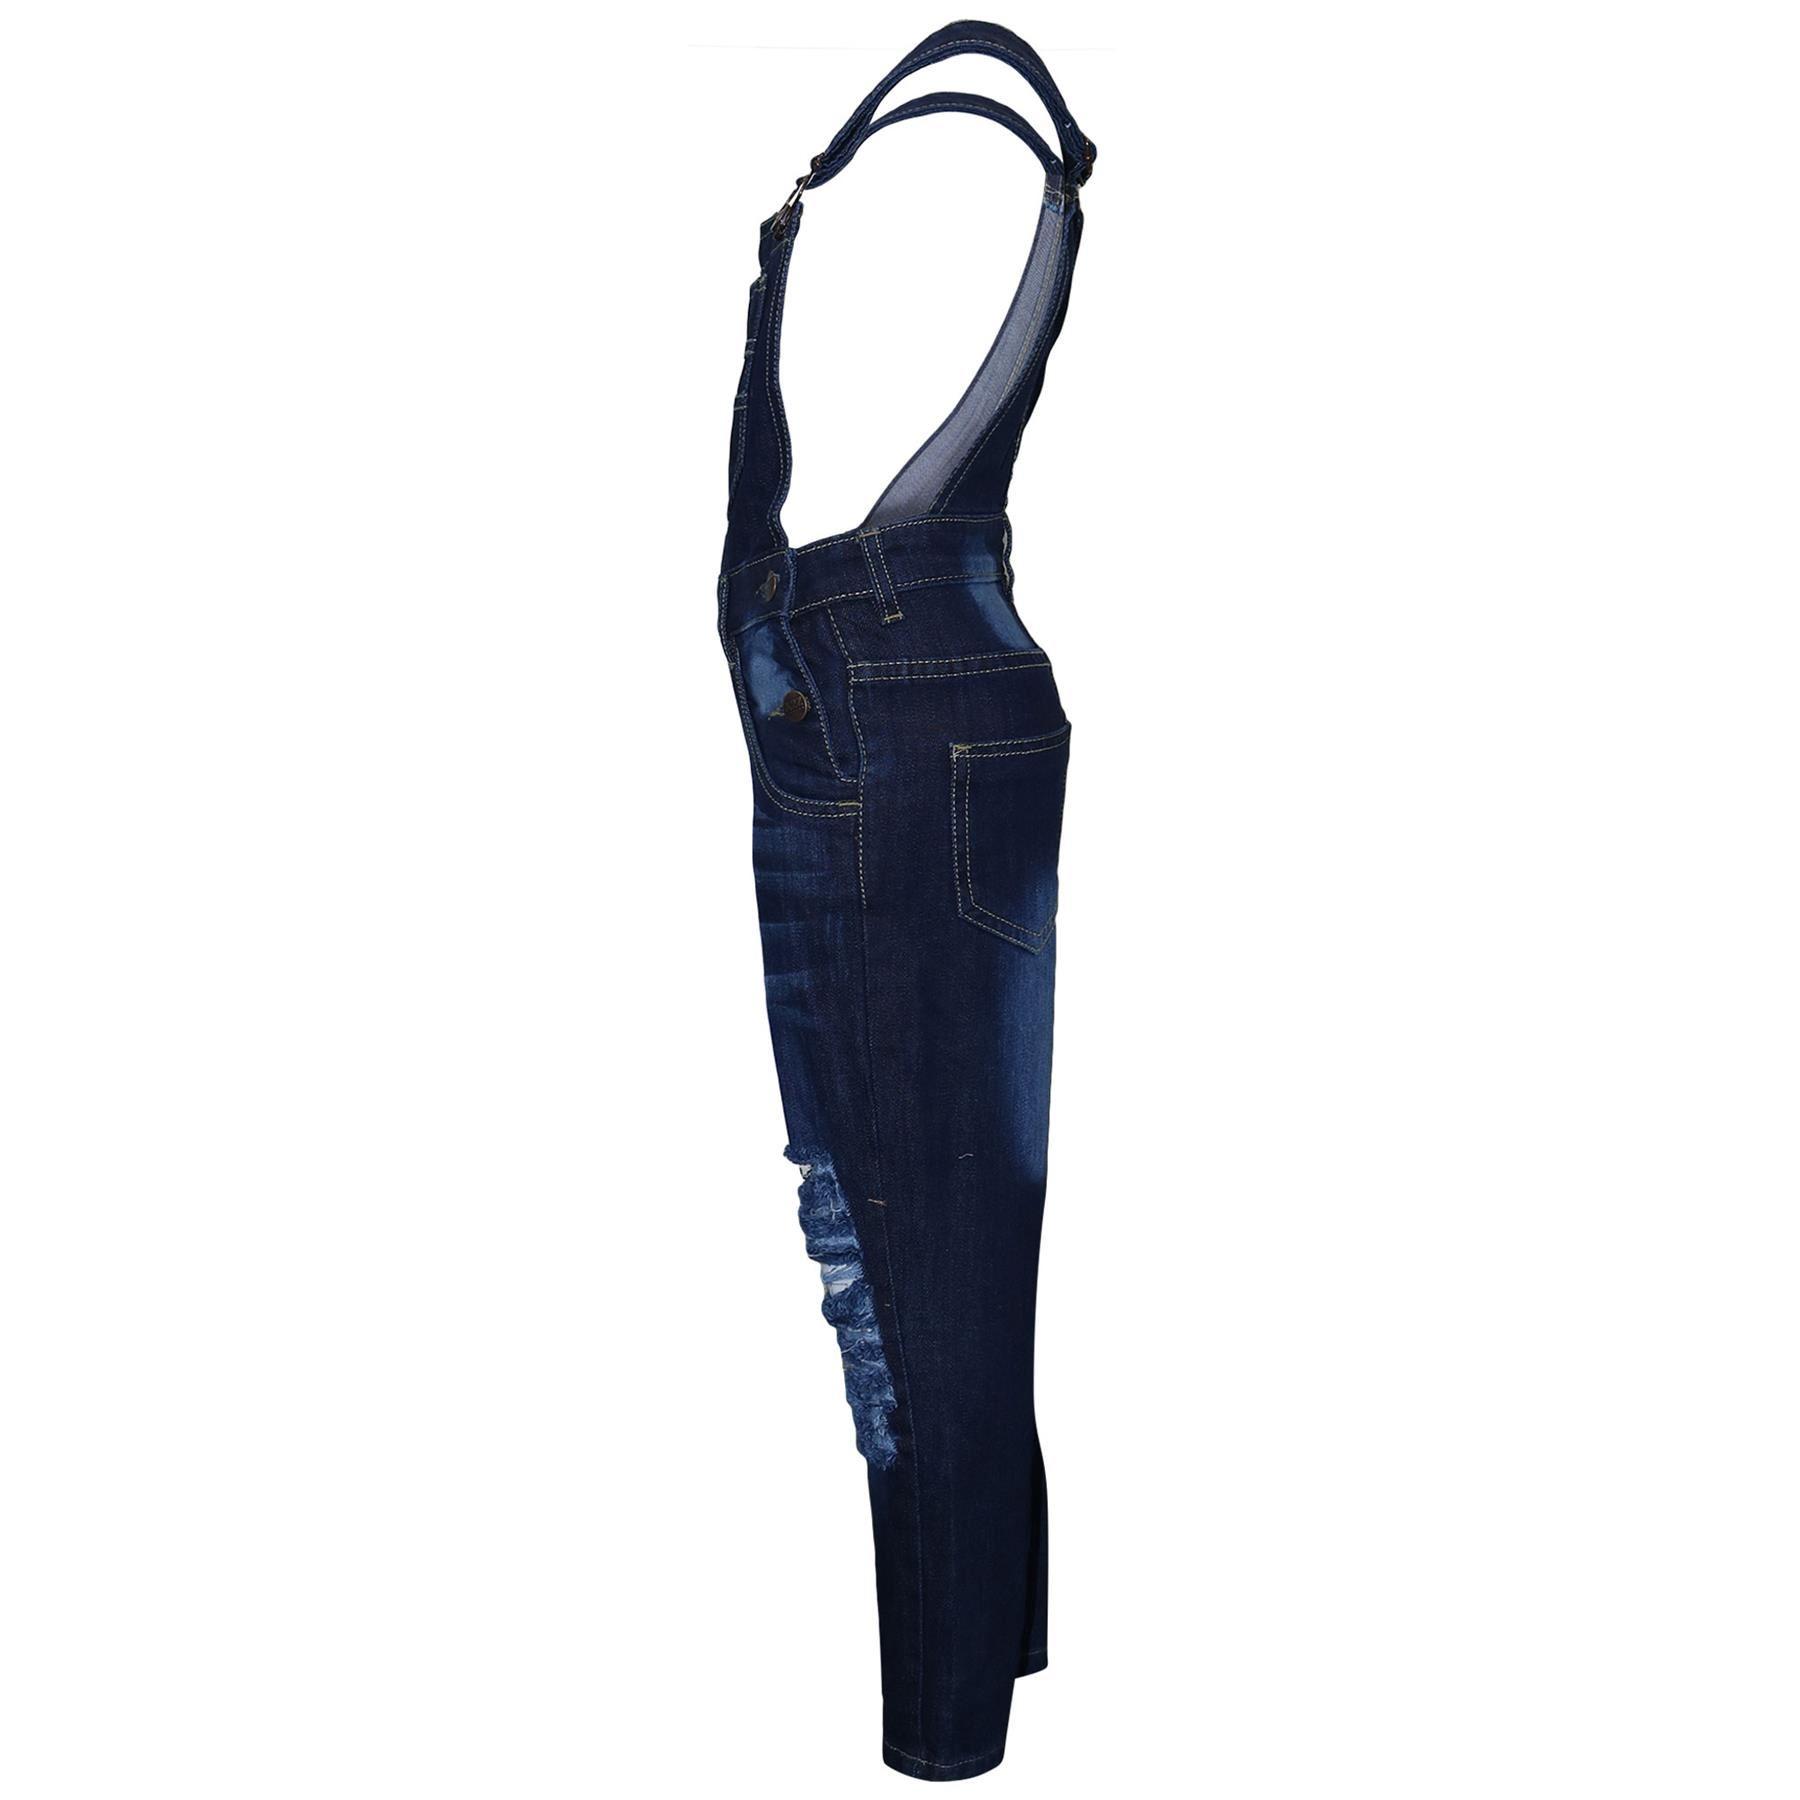 Indexbild 5 - Kinder Mädchen Denim Latzhose Zerrissen Dunkelblau Jeans Overall Mode 5-1